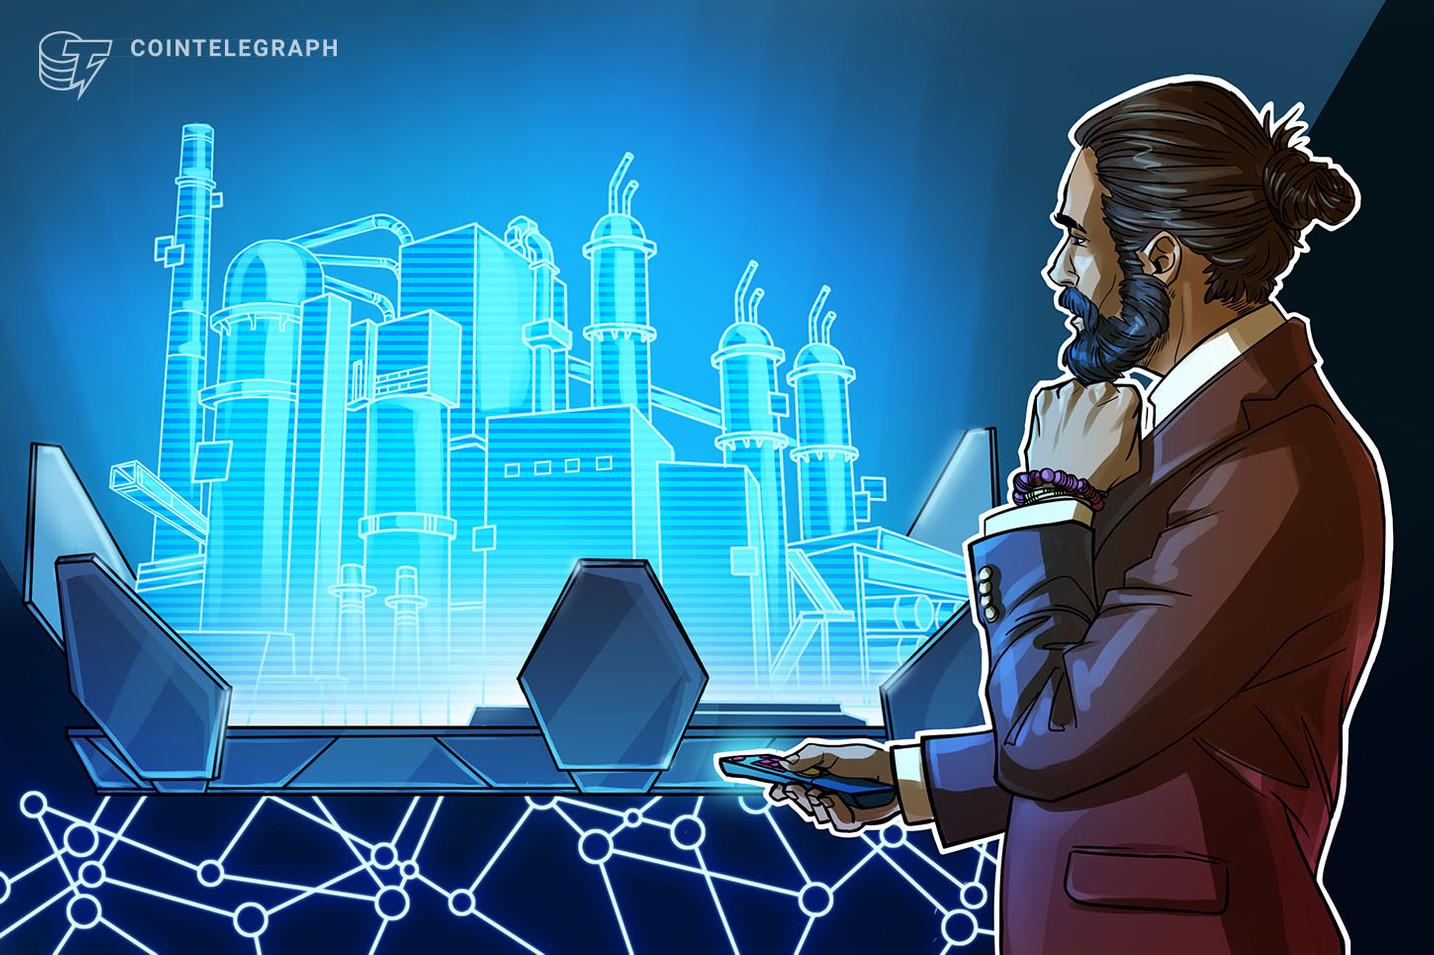 Theta blockchain launches first decentralized exchange dubbed ThetaSwap